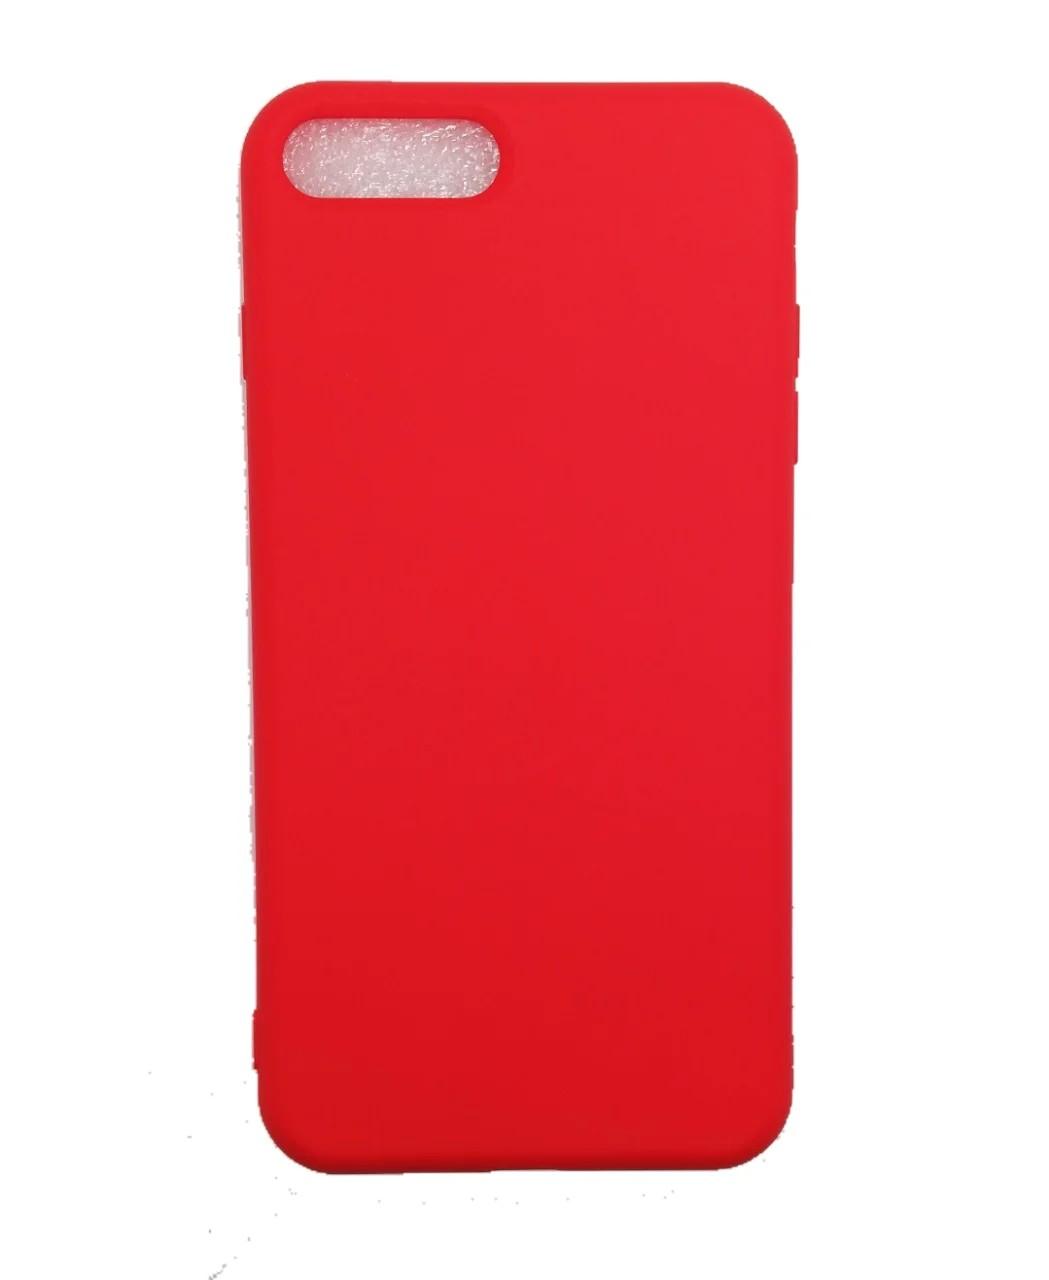 Iphone 7-8 Plus Nano Silikon Kırmızı Kılıf